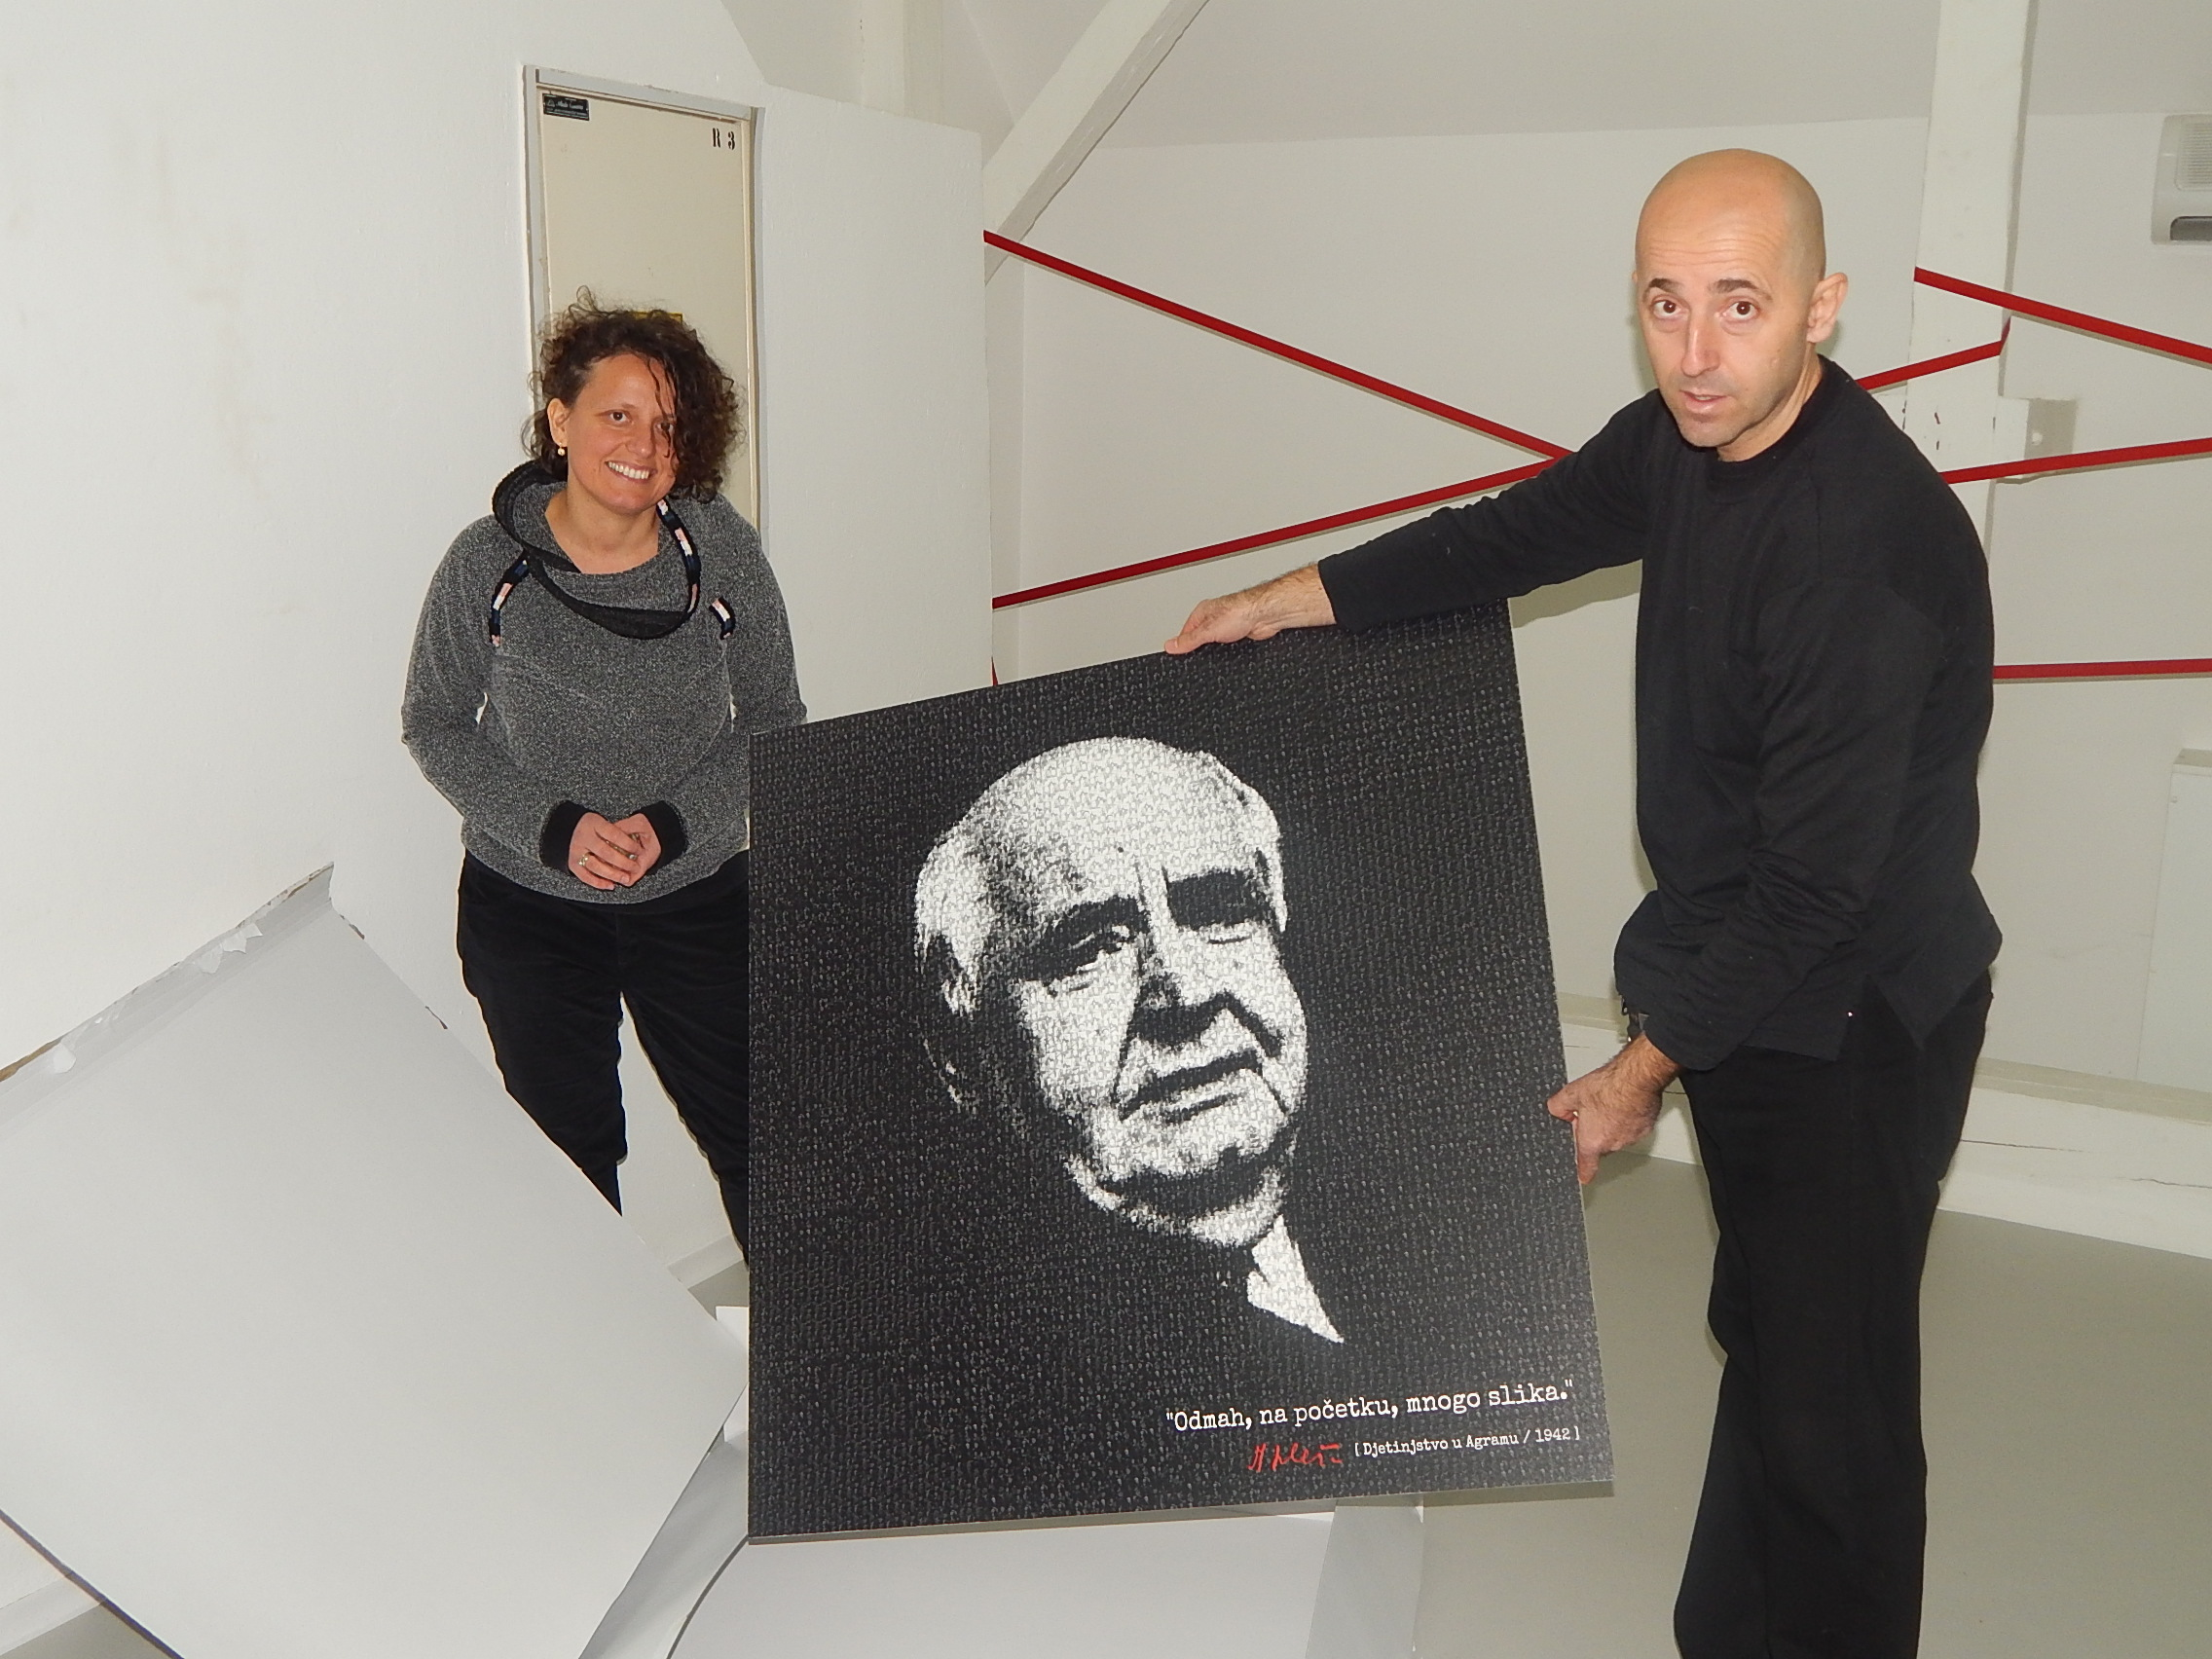 Antonija Škrtić i Josip Vrančić. Gradski muzej Karlovac, 21. 12. 2016. Foto: Marin Bakić